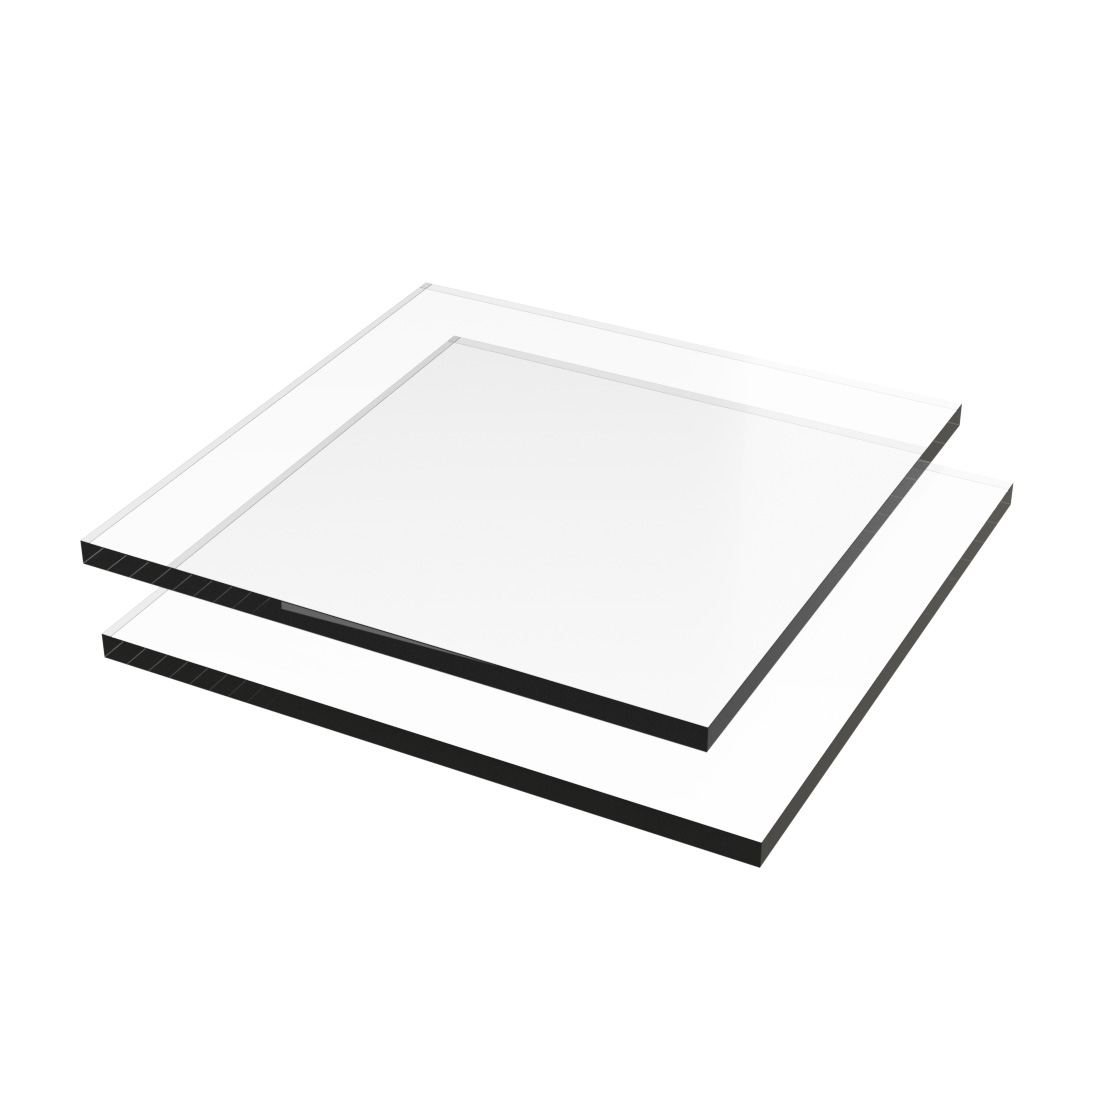 Vinplast PVC Plaat SX XT Transparant Dubbelzijdig folie 2000x1000x1mm